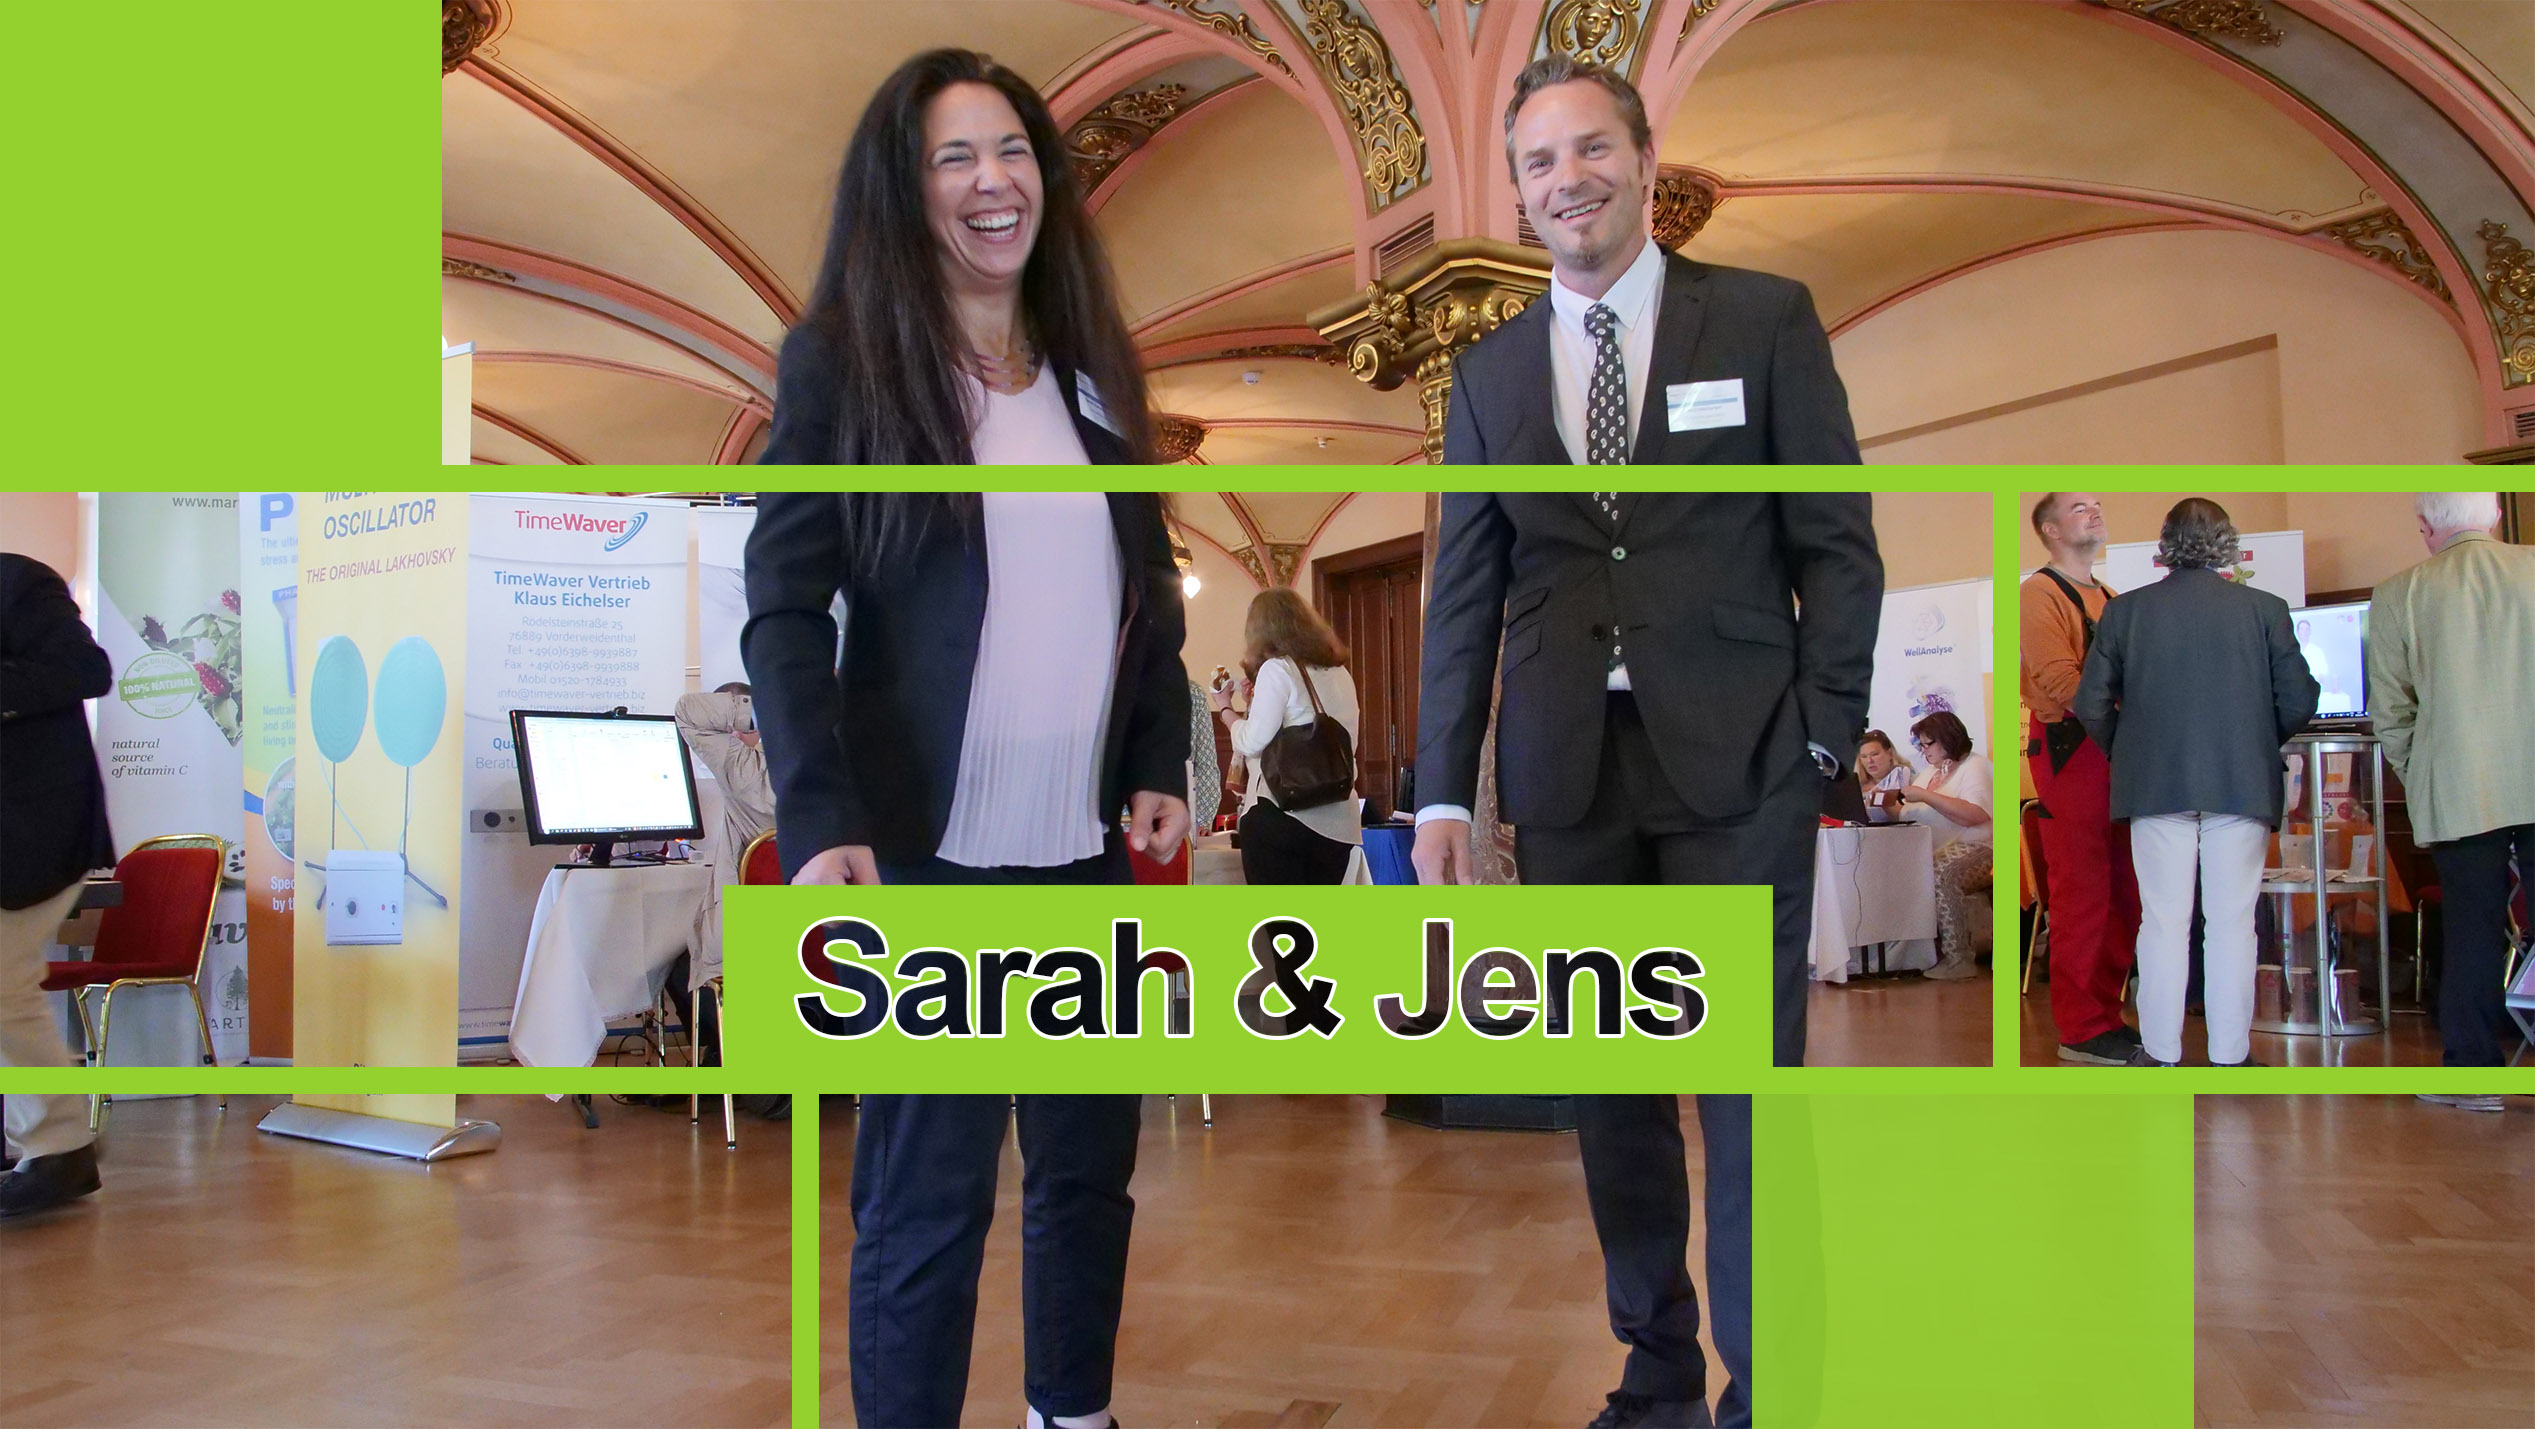 Sahra und Jens Fullhand Events